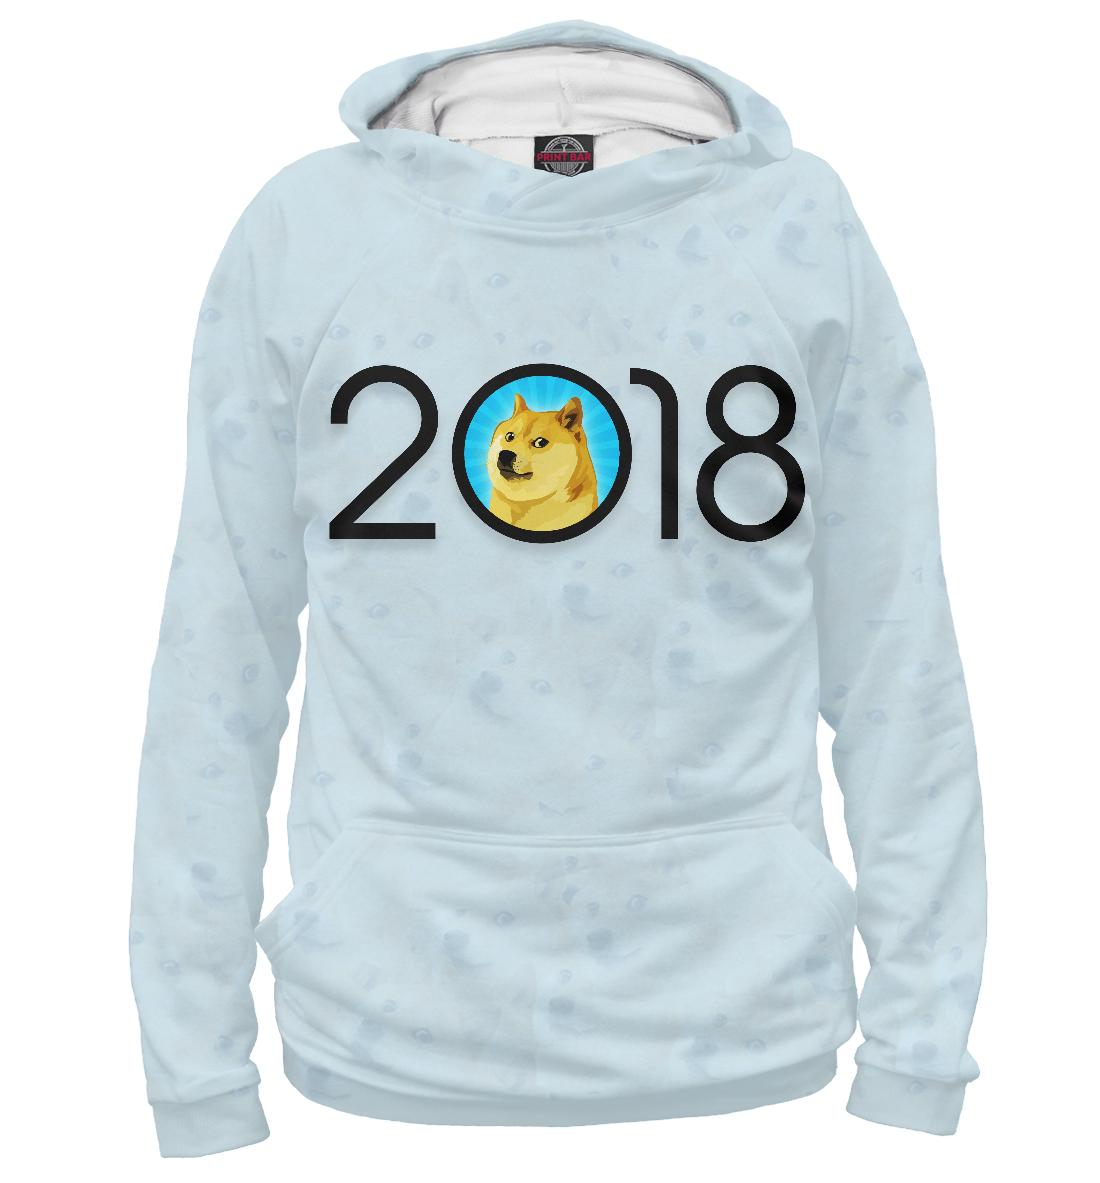 Купить 2018 Doge Year, Printbar, Худи, NOV-116937-hud-1